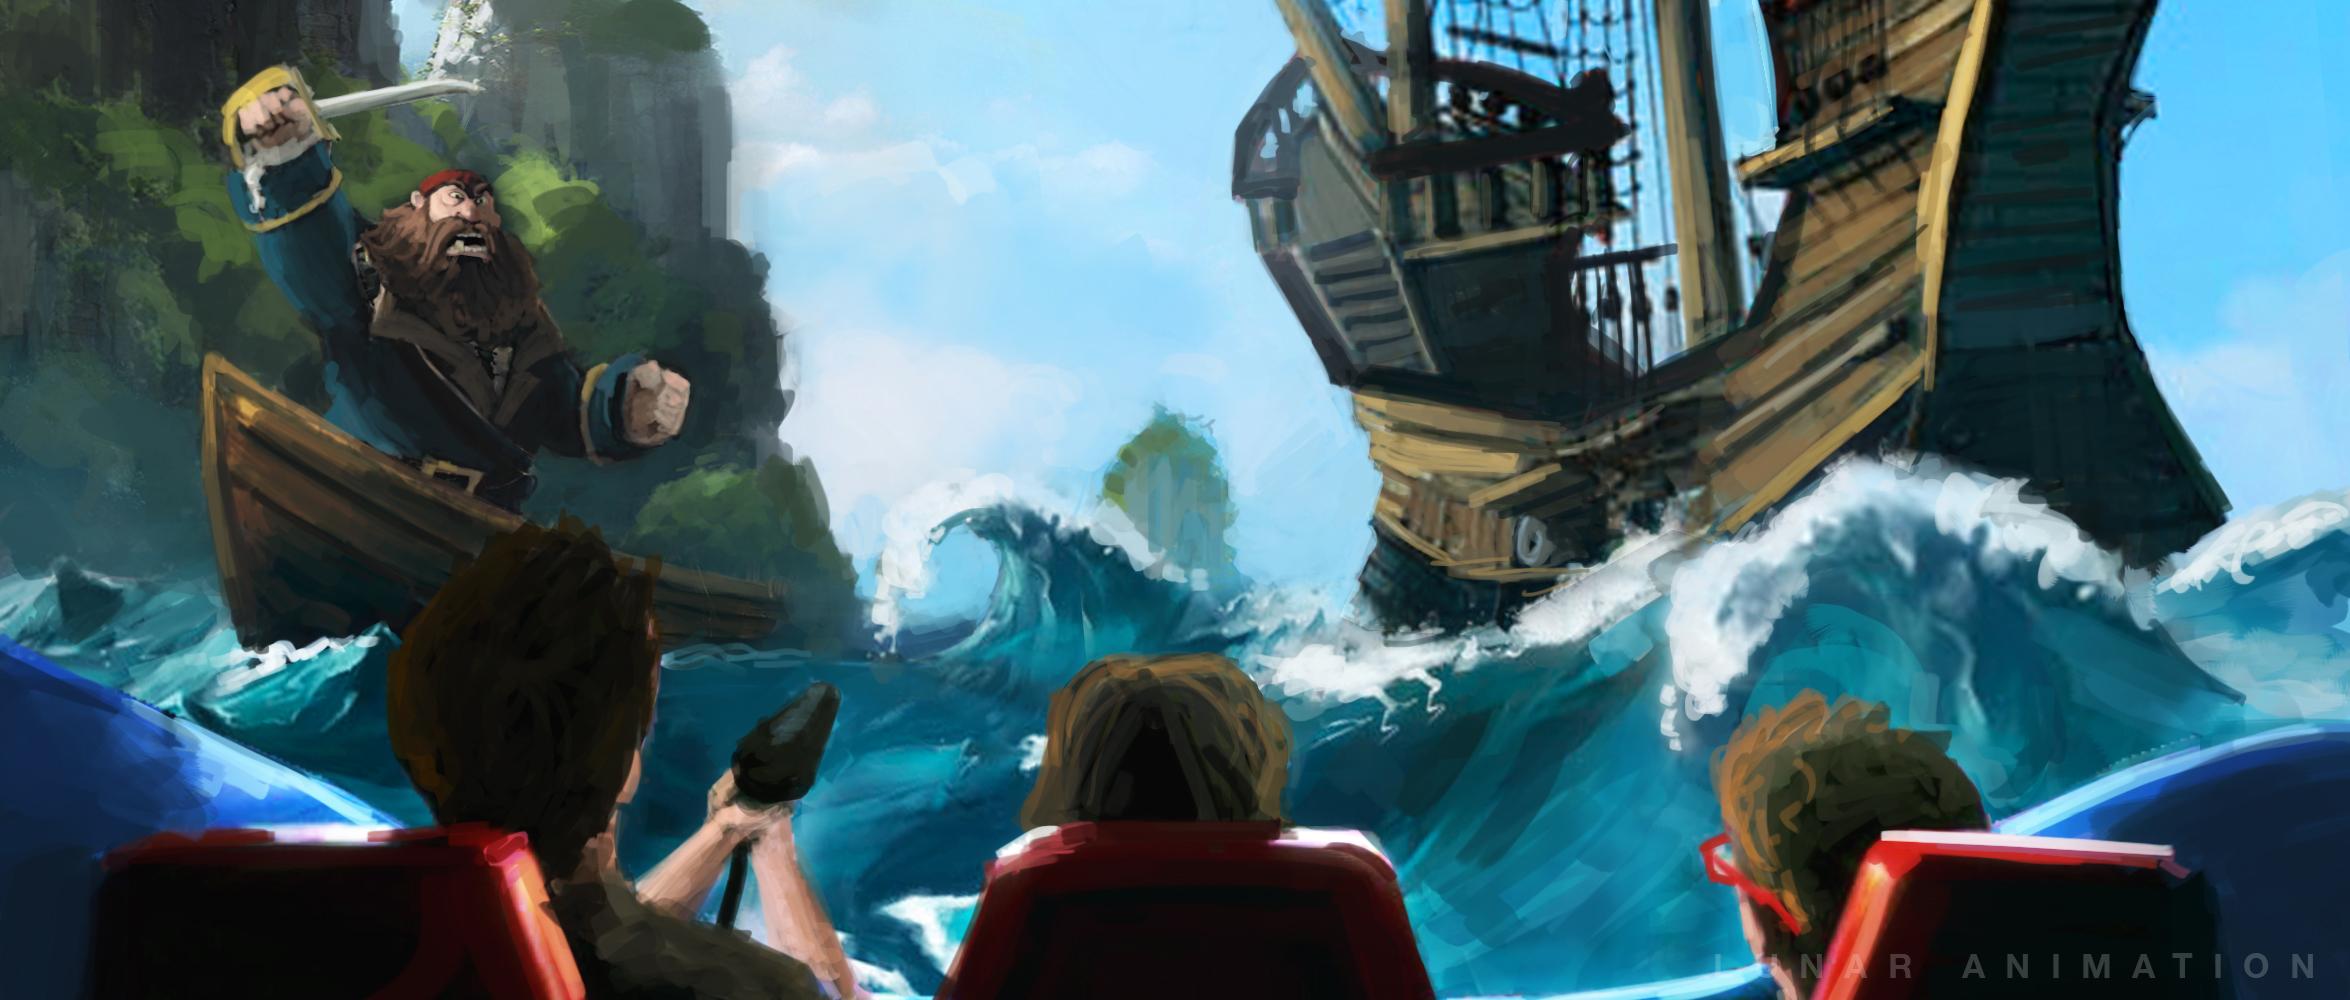 Interactive Ride Concept Art - Pirates